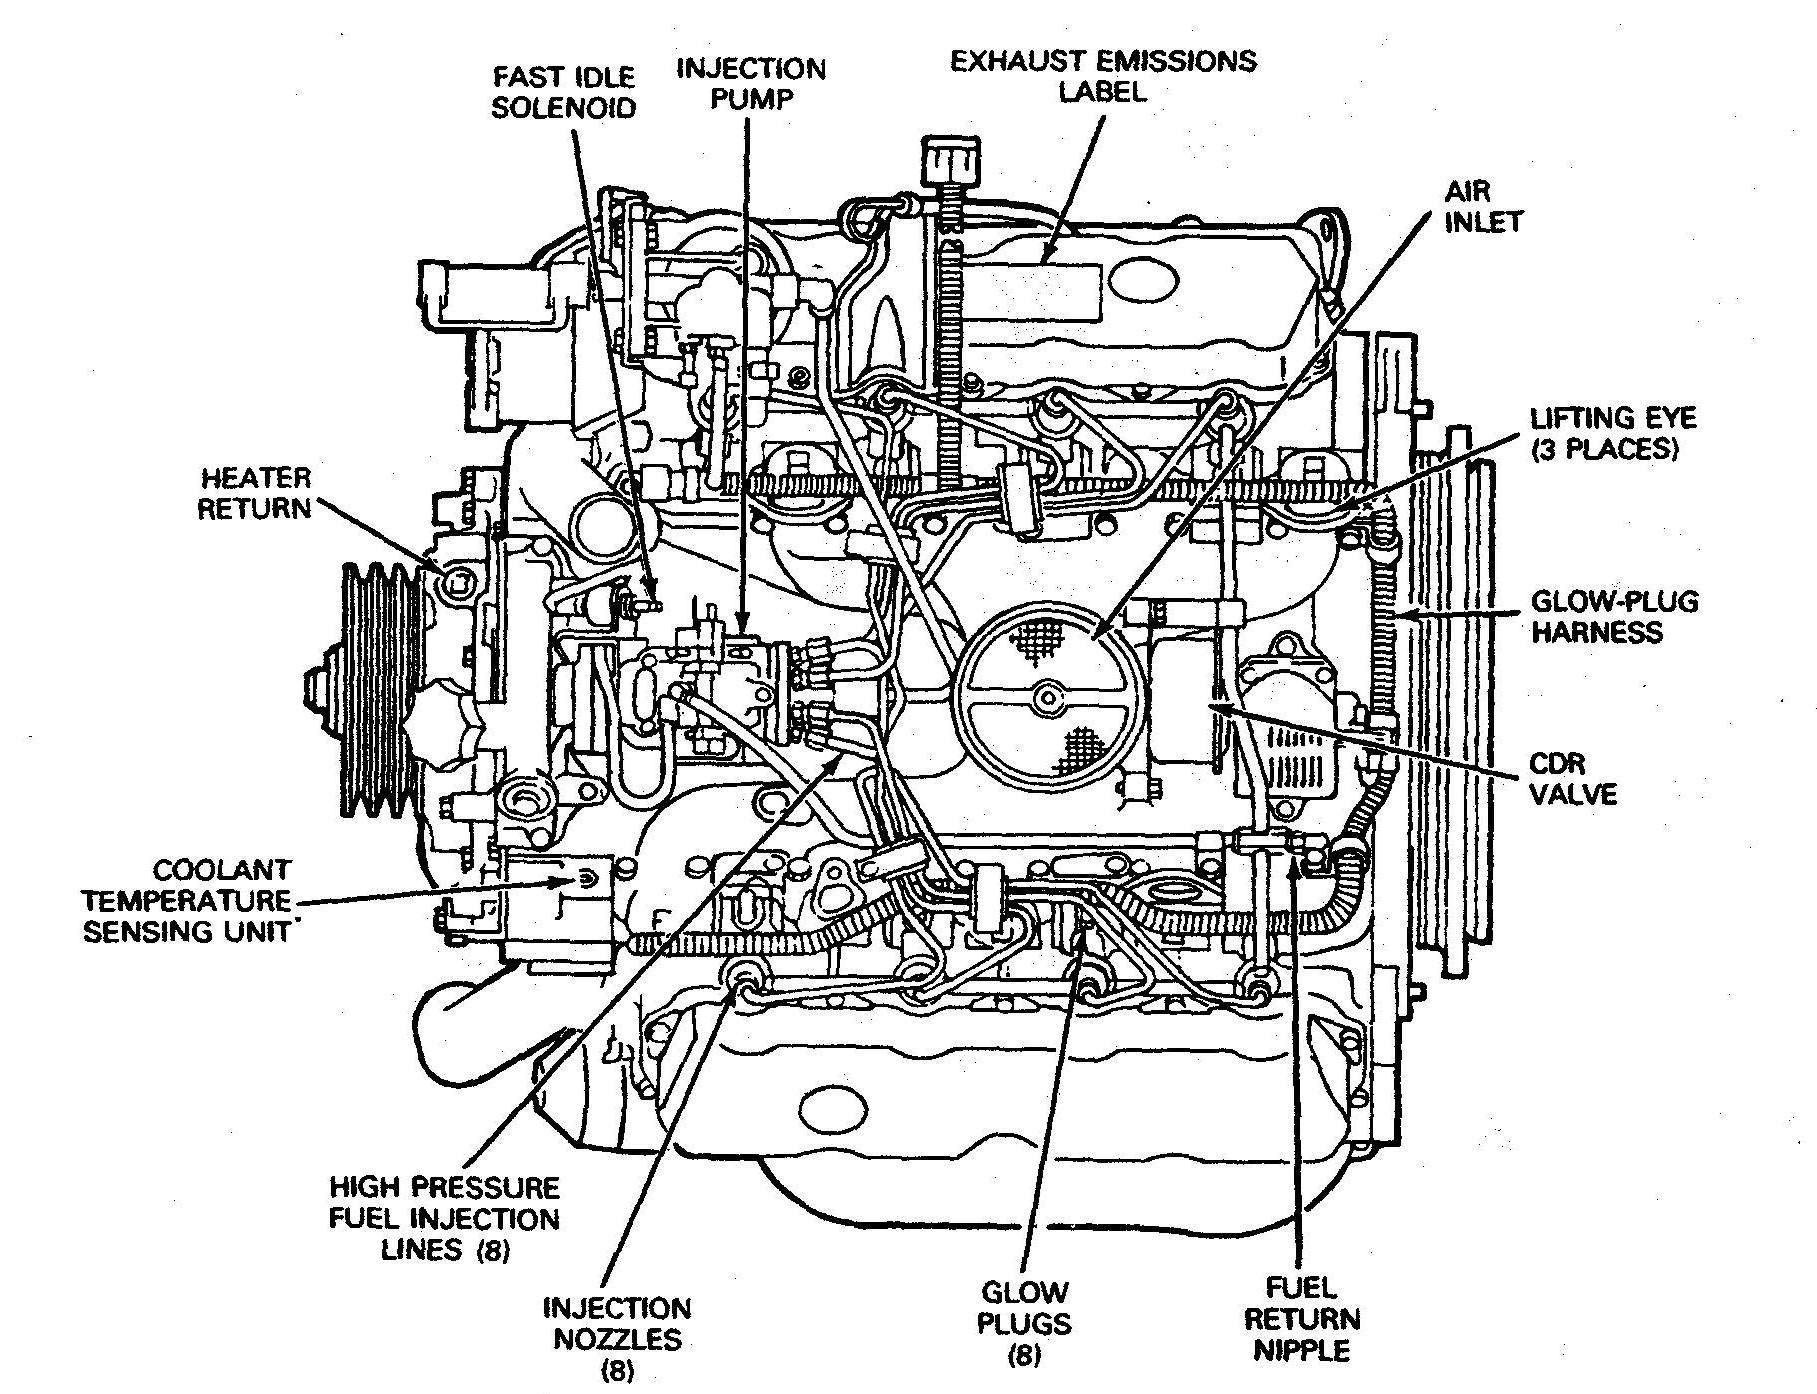 [DIAGRAM] Auto Engine Diagrams Online